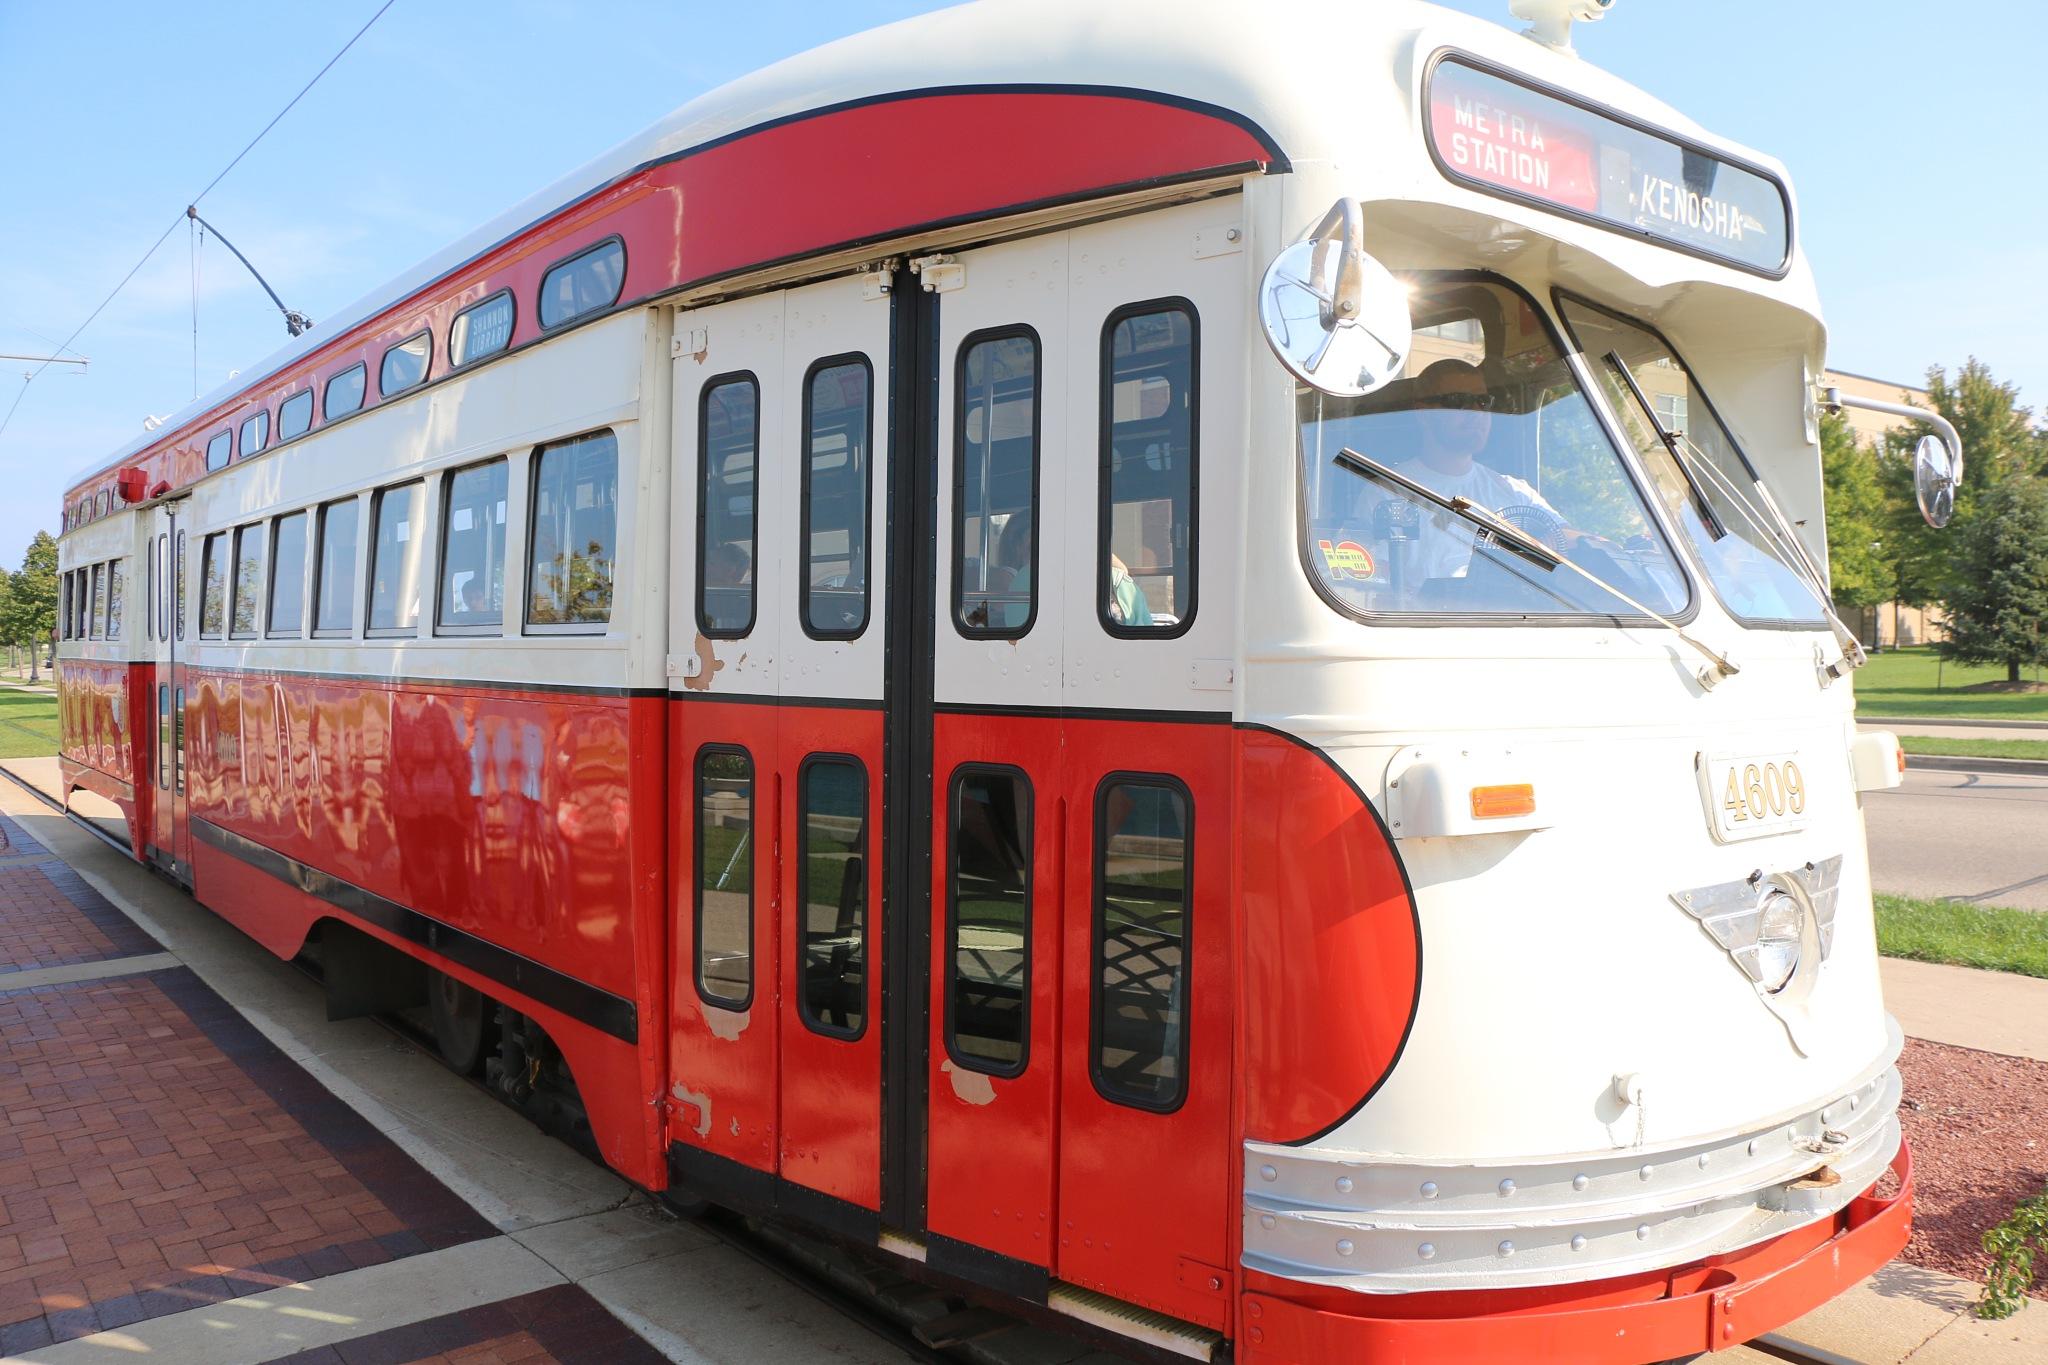 kenosha trolley car street car by Jon Radtke